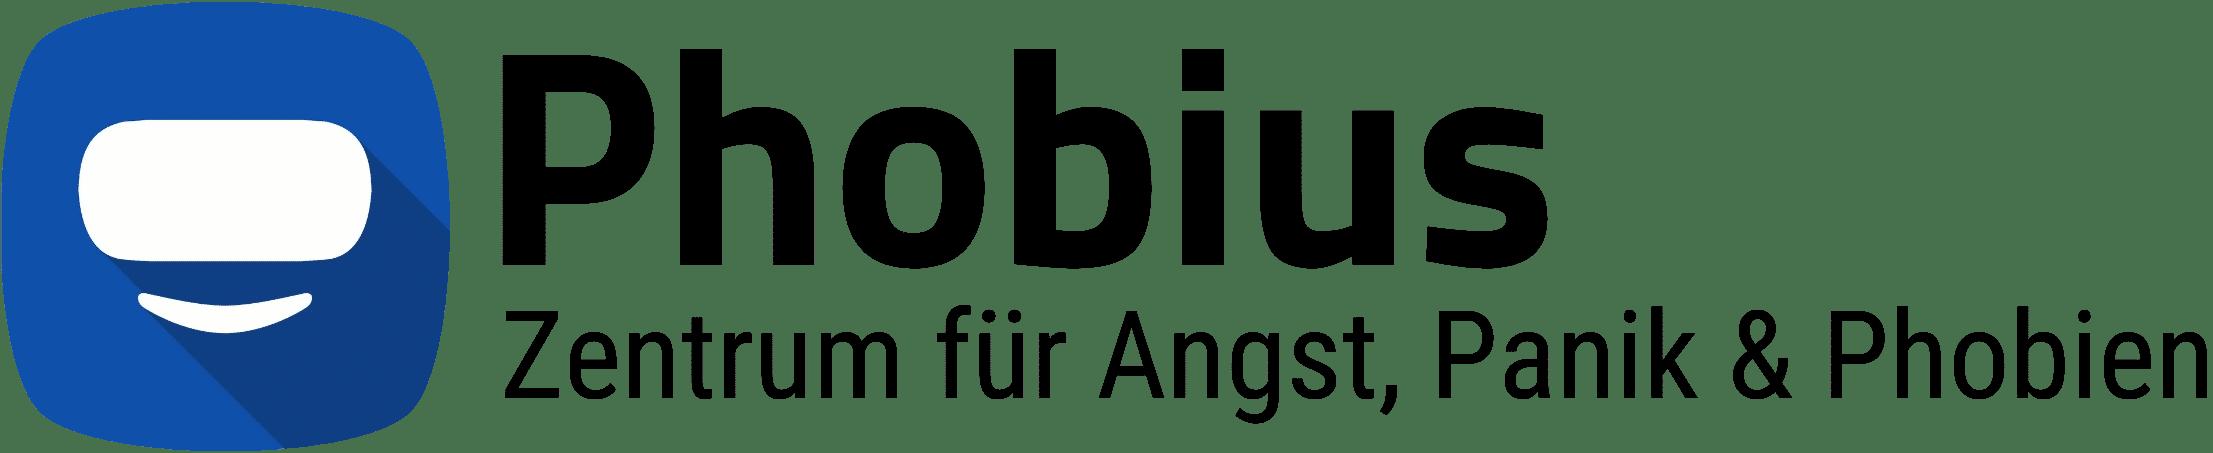 Phobius Logo